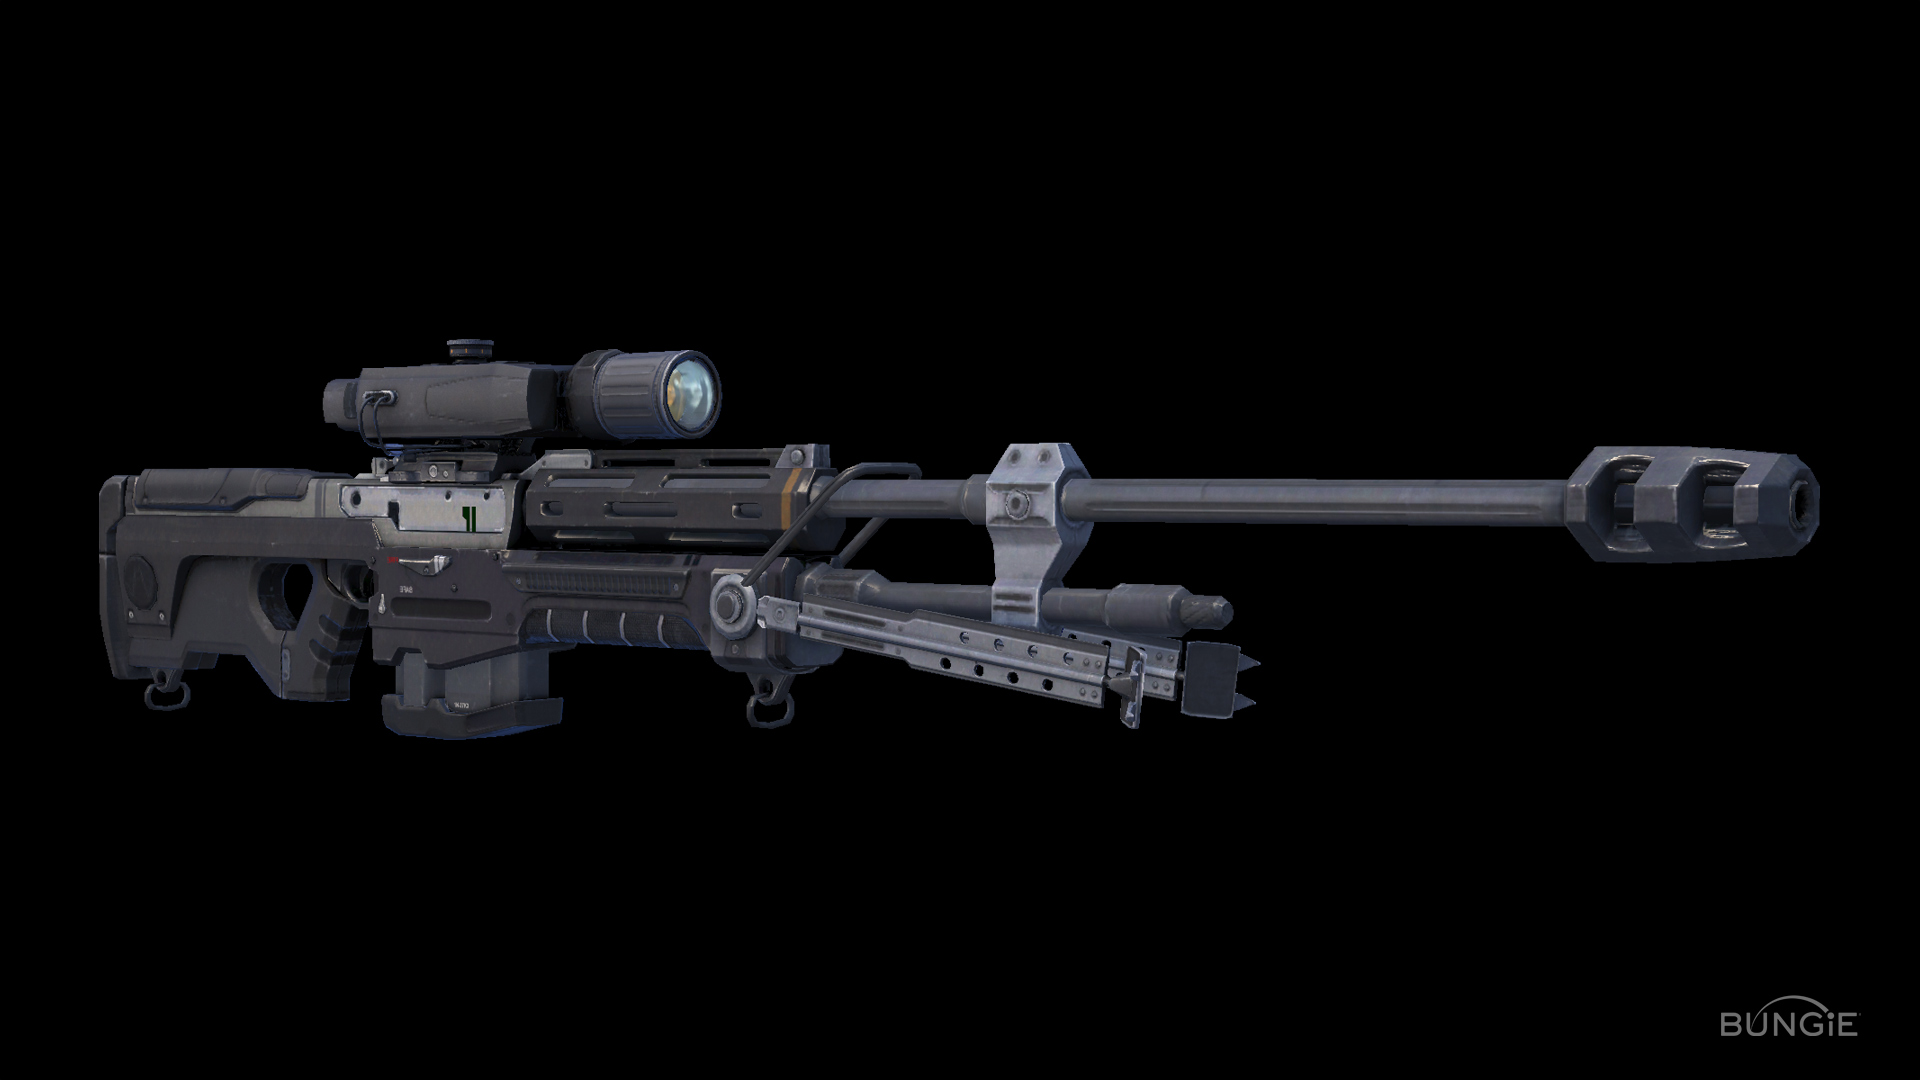 Sniper Rifle wallpaper   ForWallpapercom 1920x1080